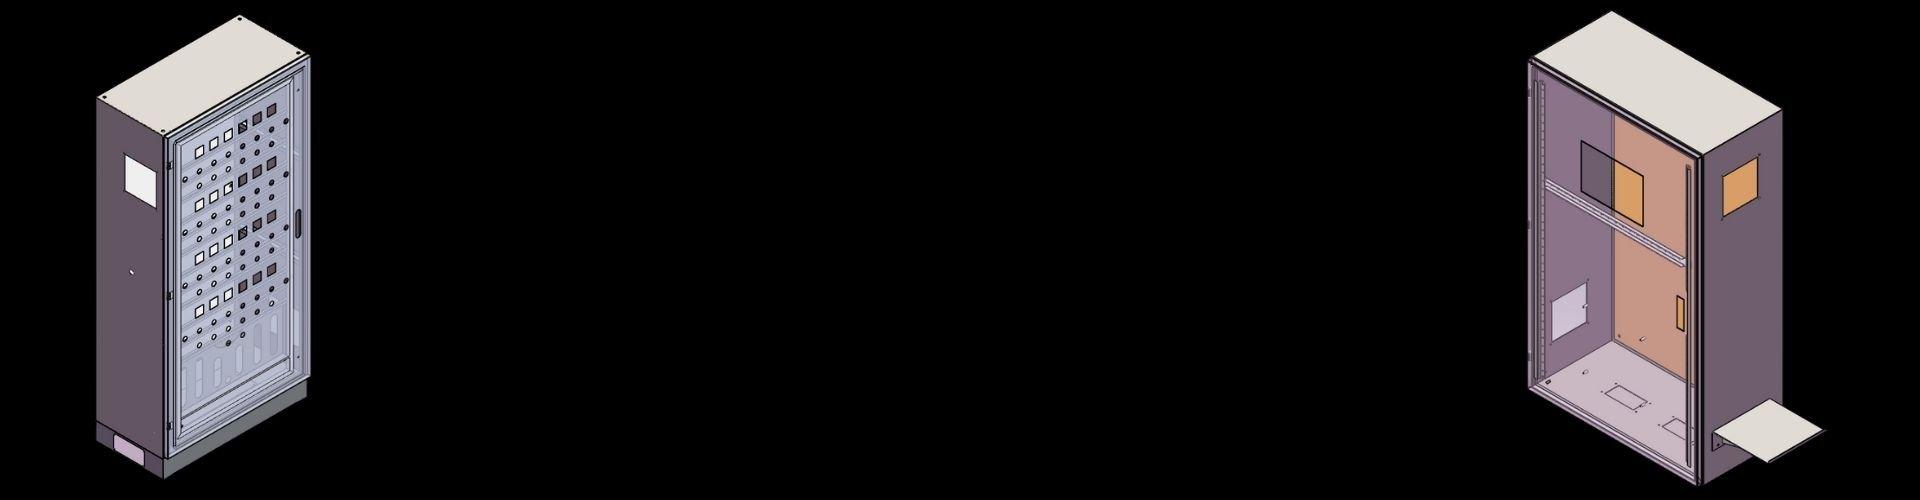 electrical enclosure design example